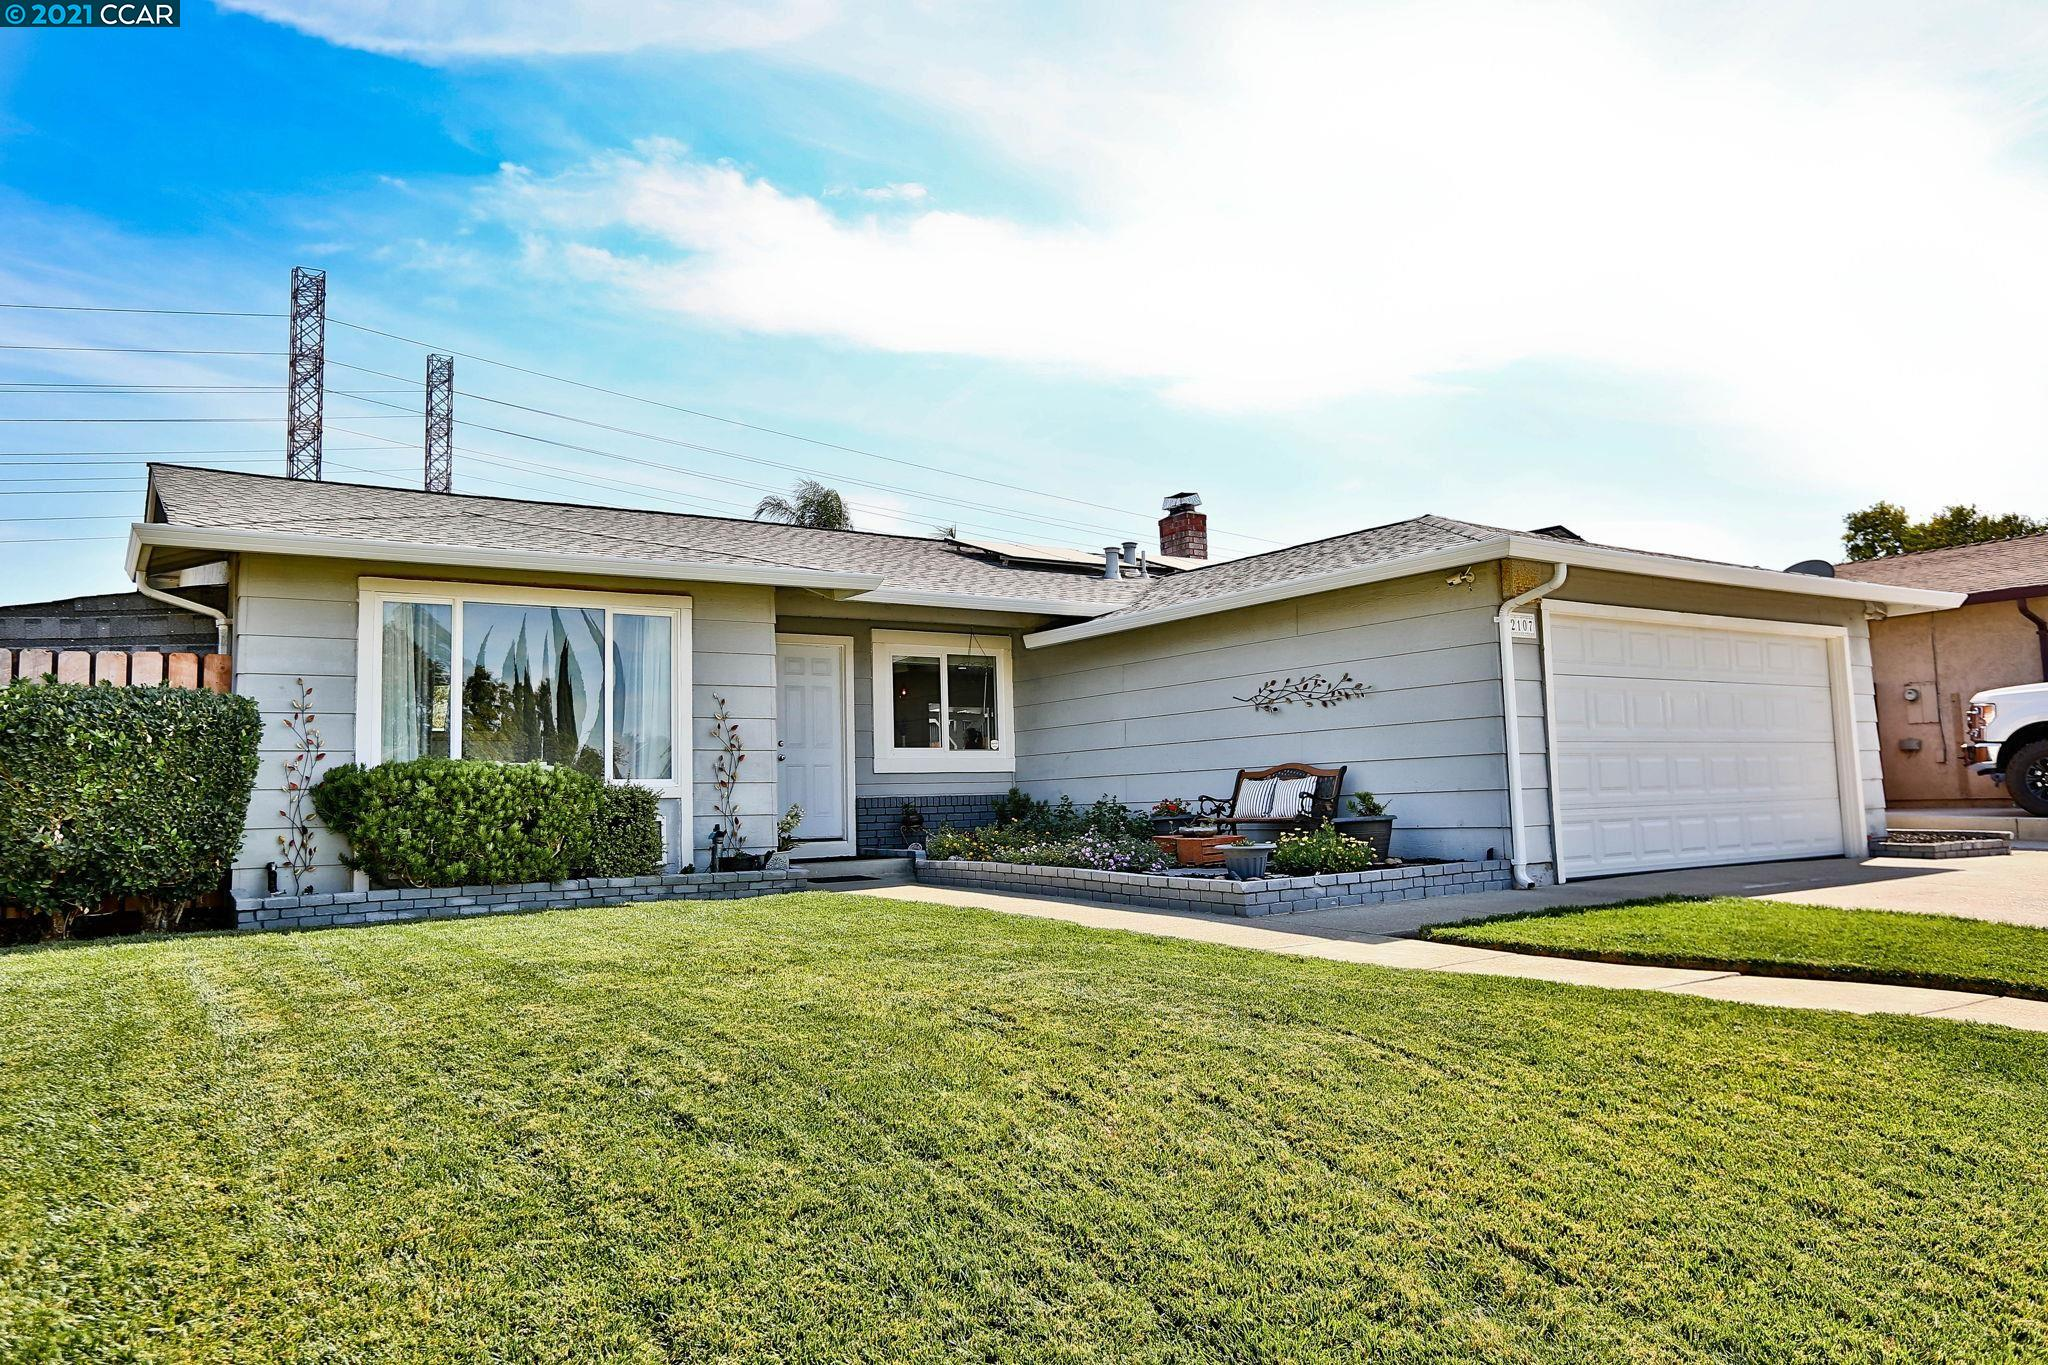 2107 Bodega Ct, PITTSBURG, CA 94565